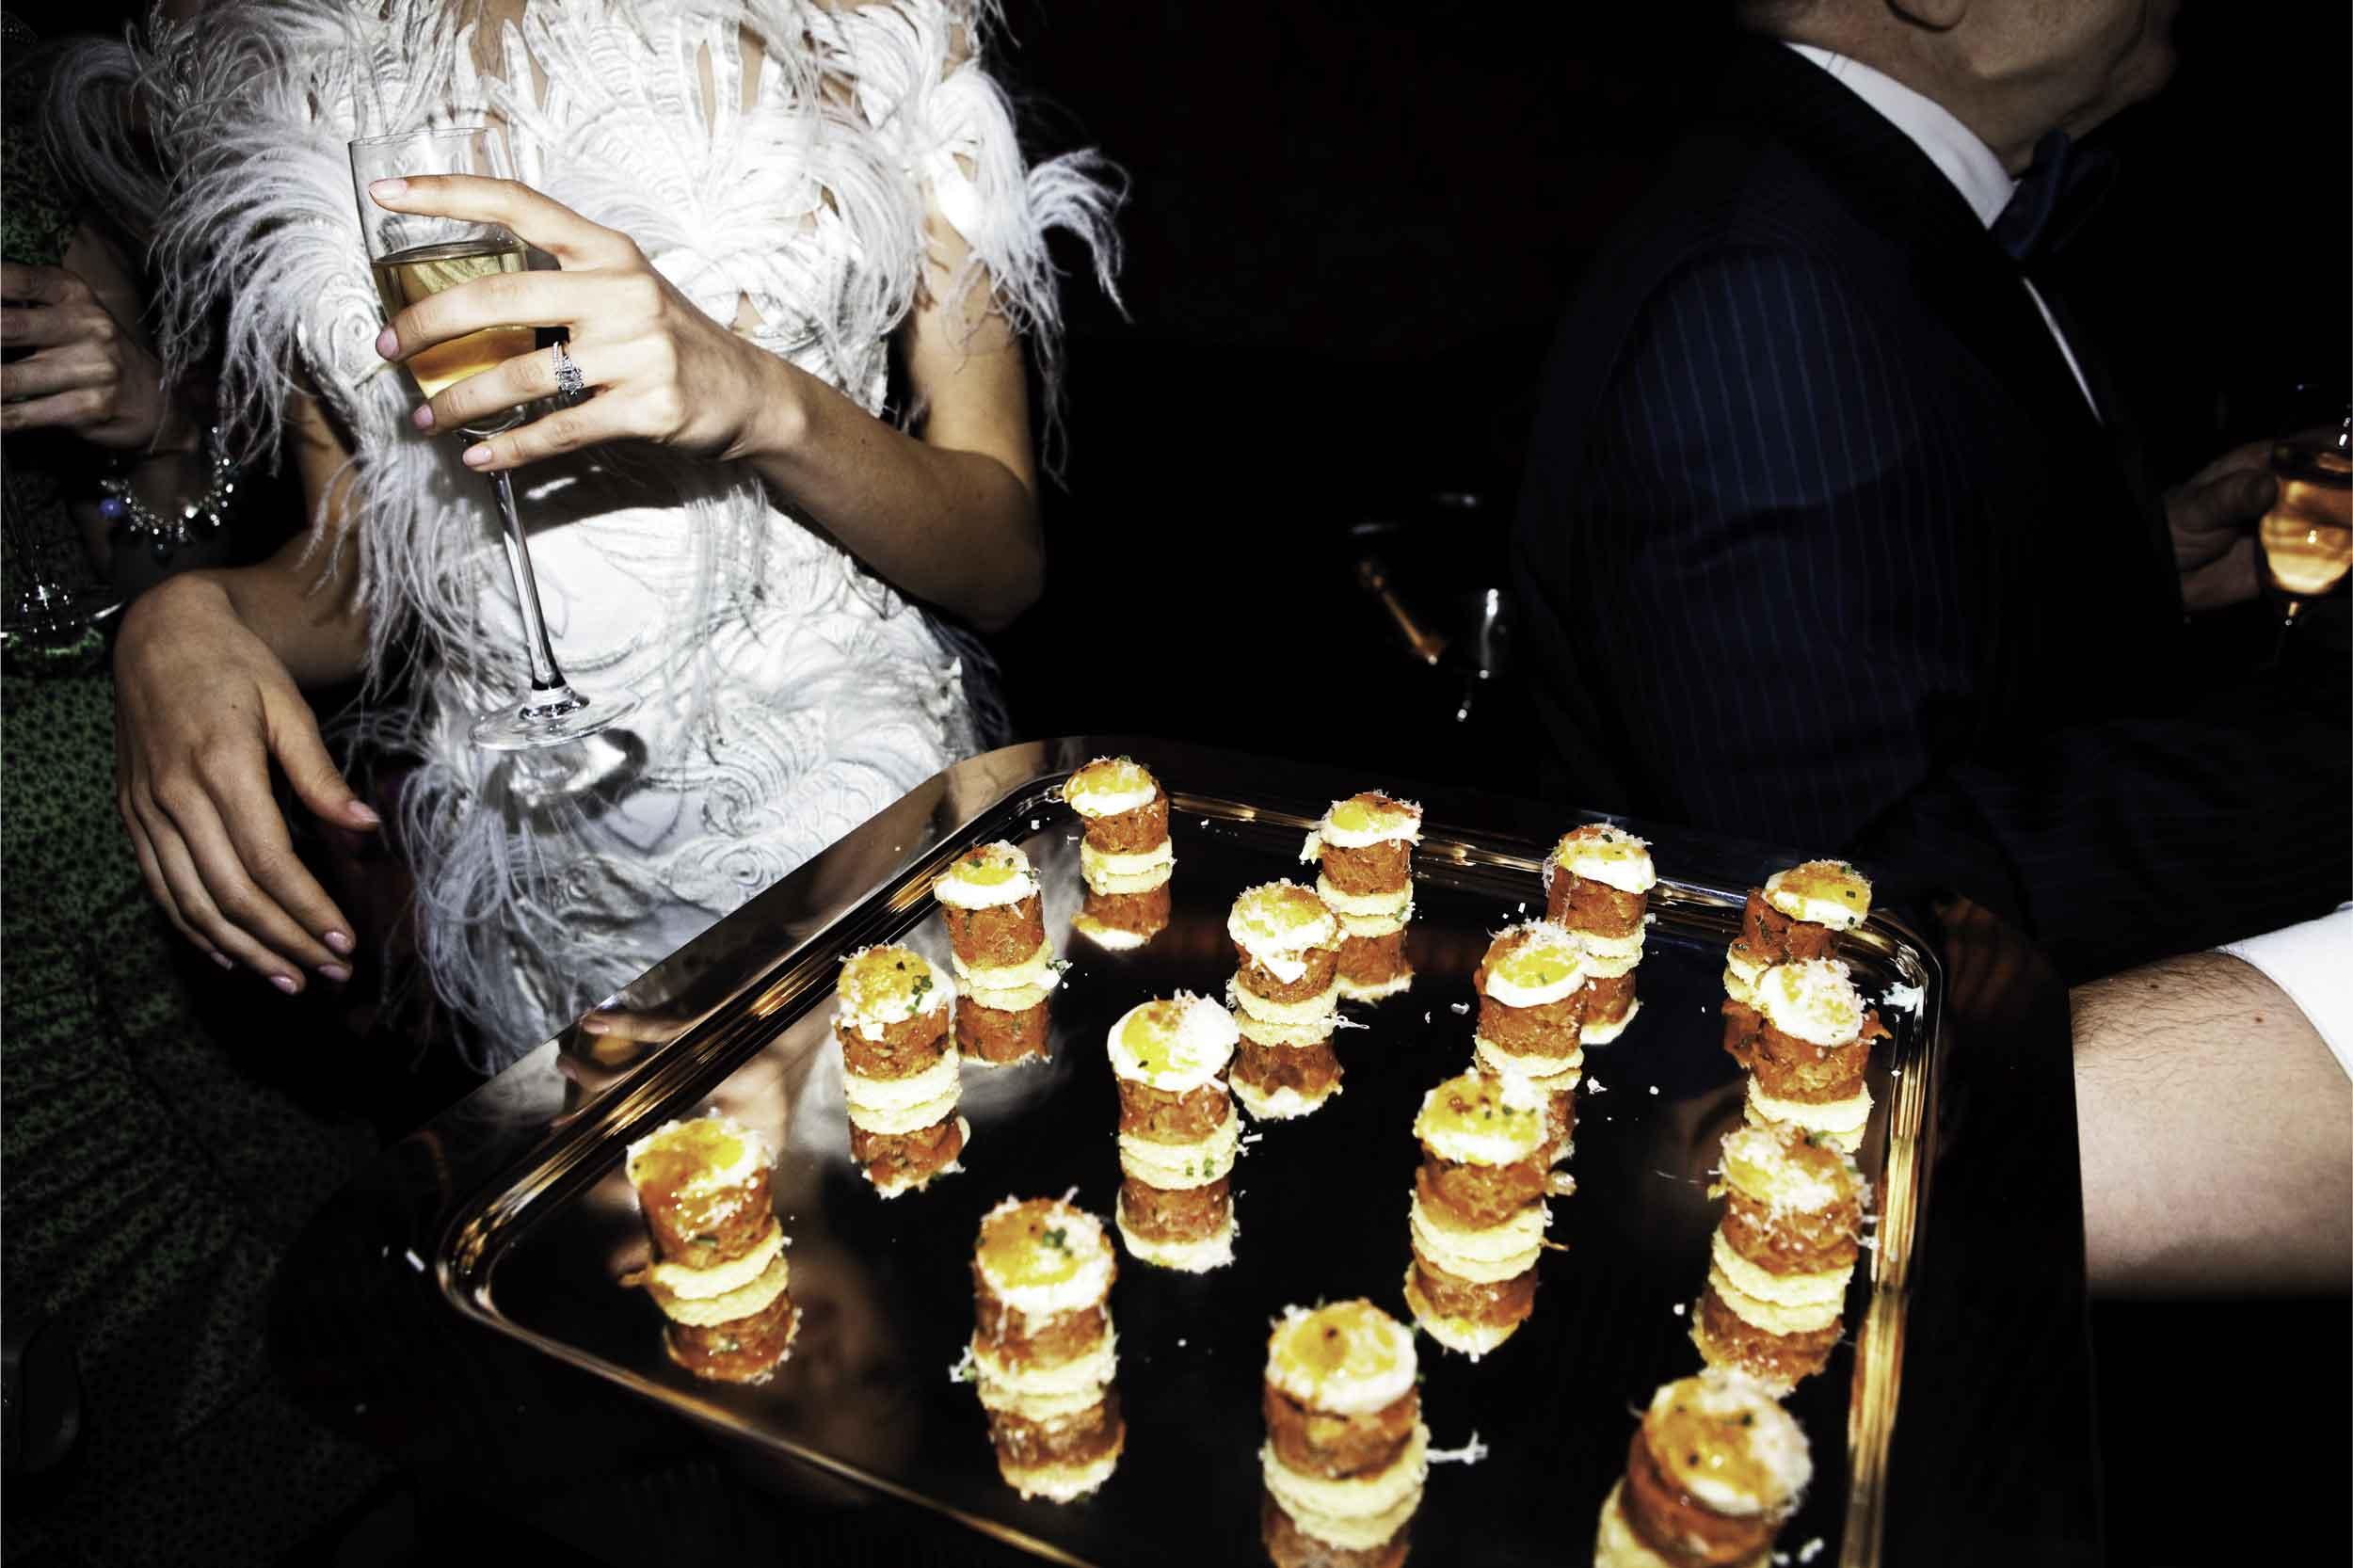 brides-jessica-craig-martin-4.jpg